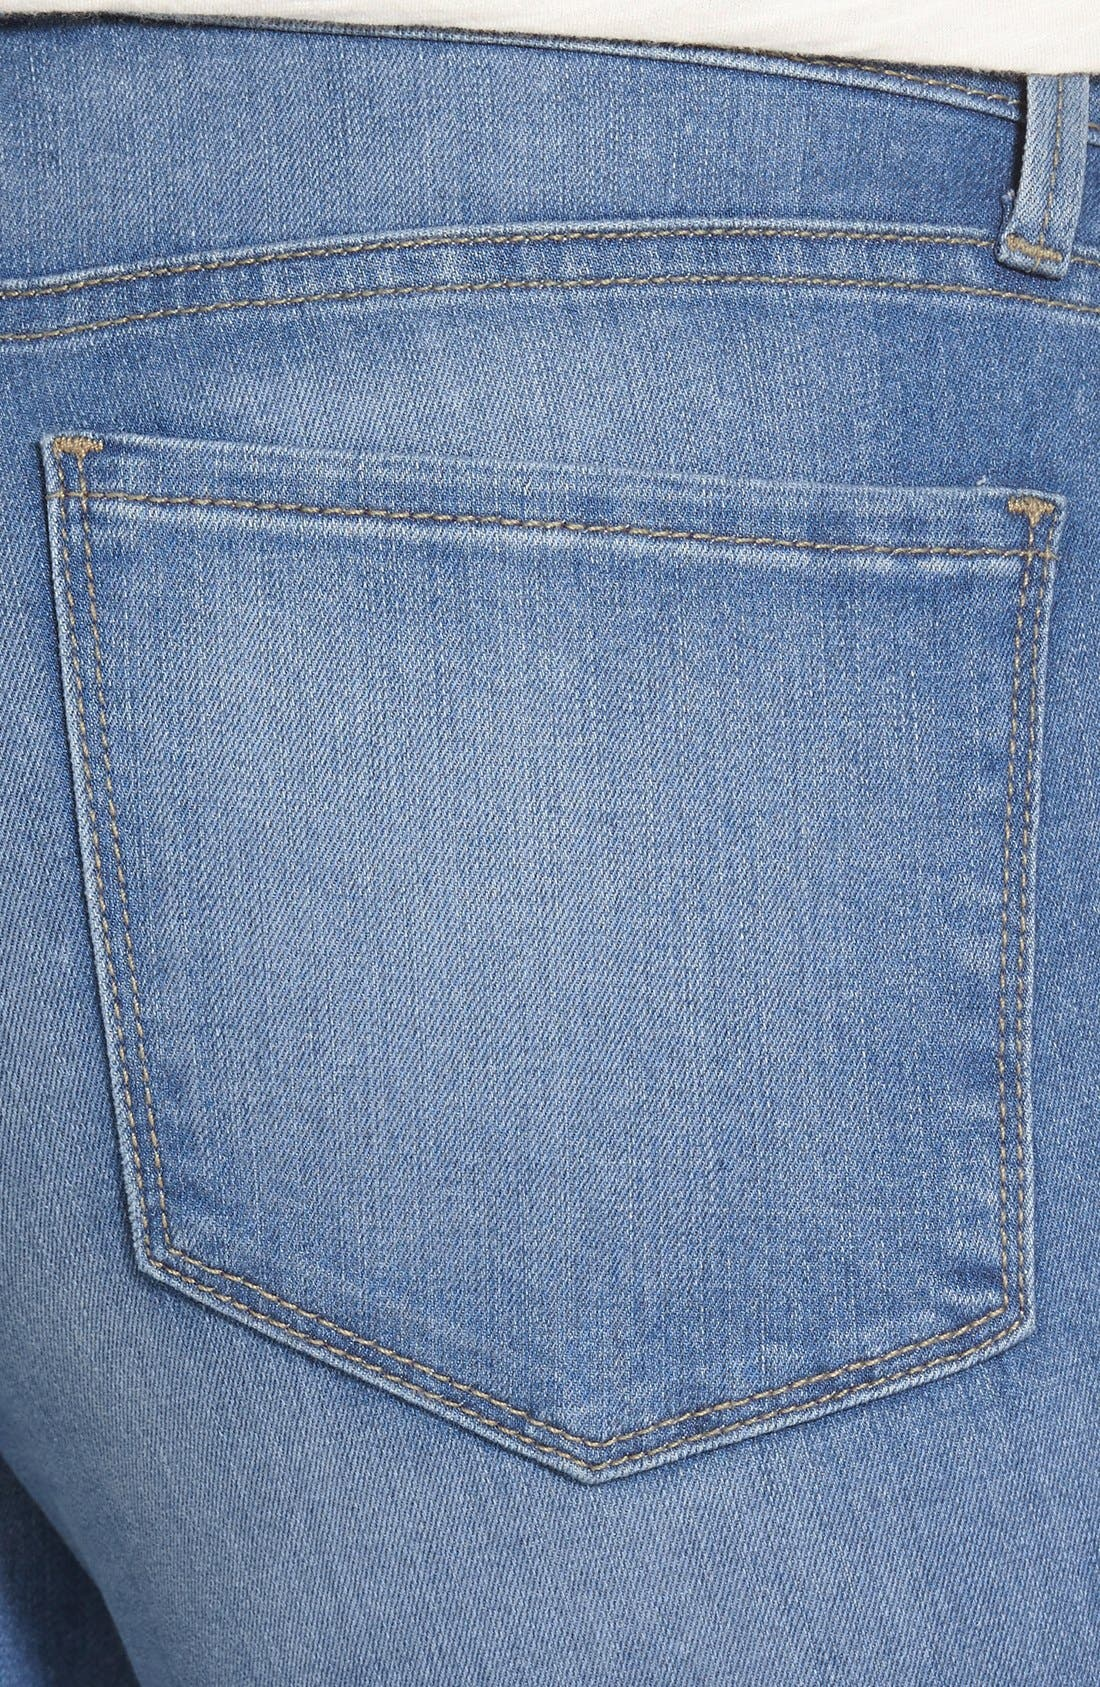 Alternate Image 4  - NYDJ 'Farrah' Stretch Flare Leg Jeans (Upper Falls)